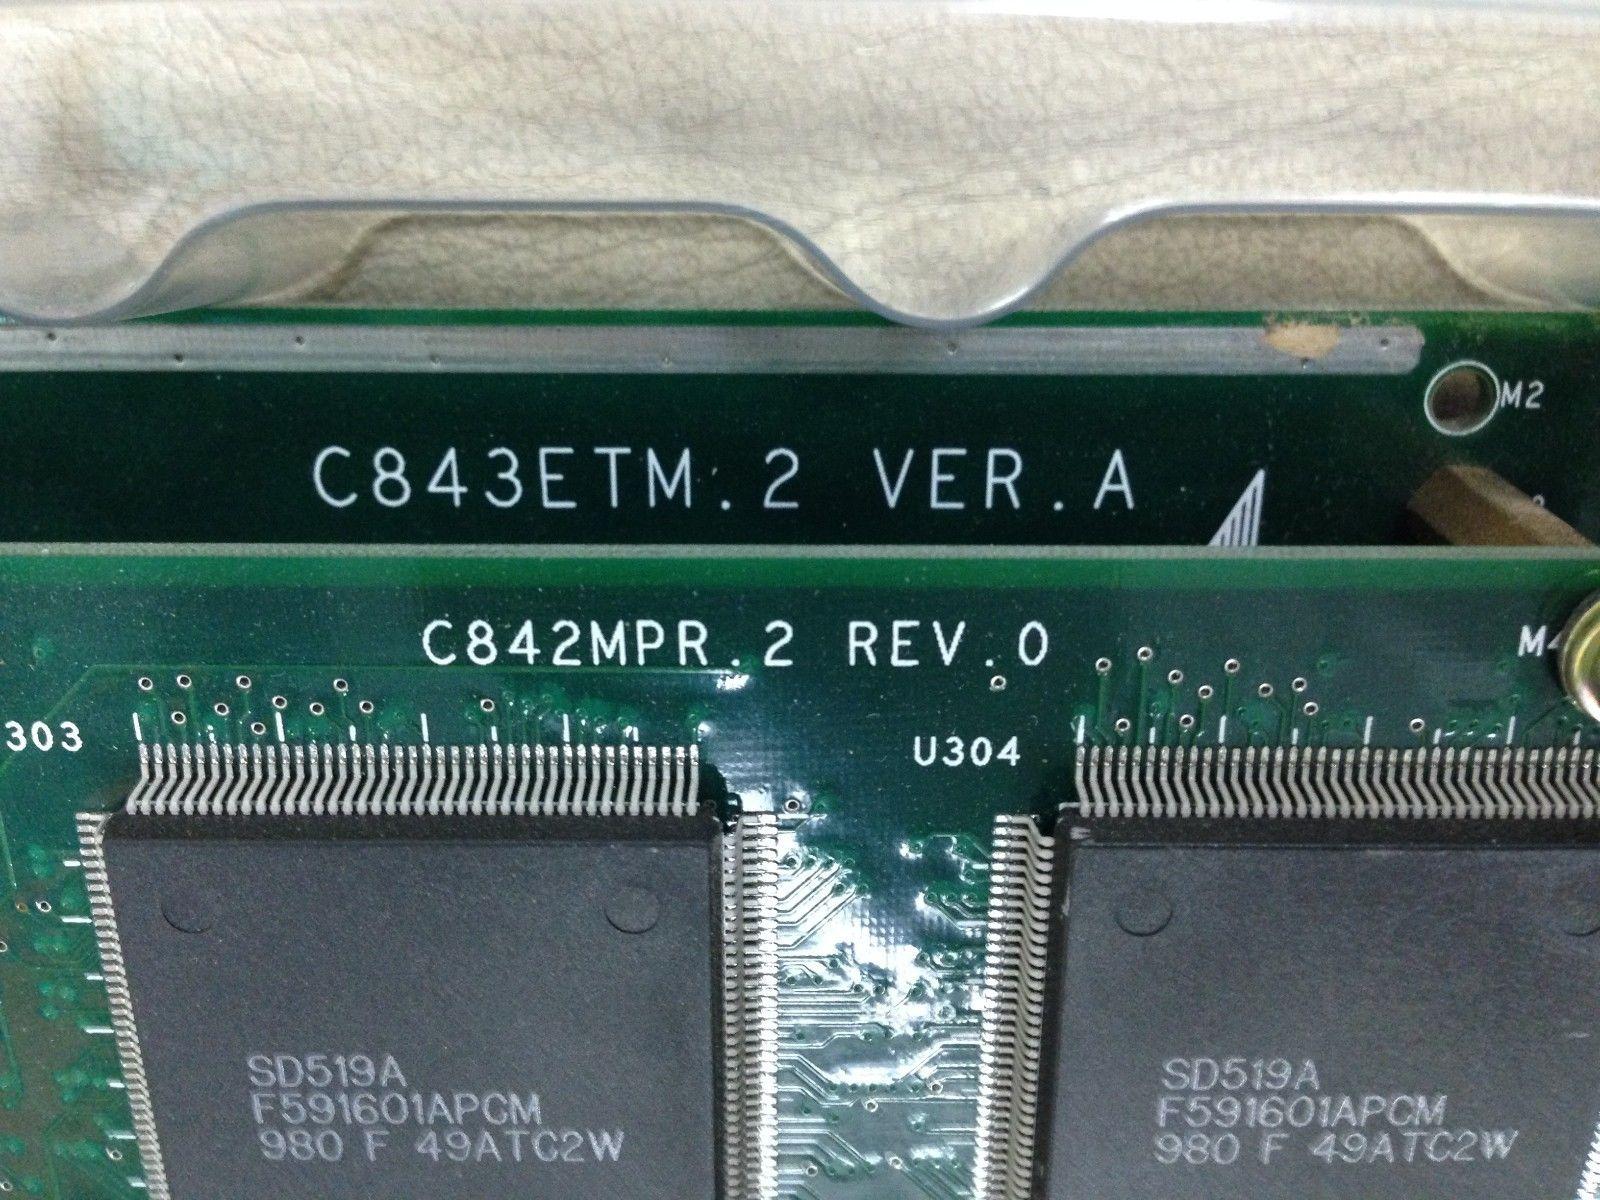 Huawei interface module c843etm .2 ver a c842mpr .2